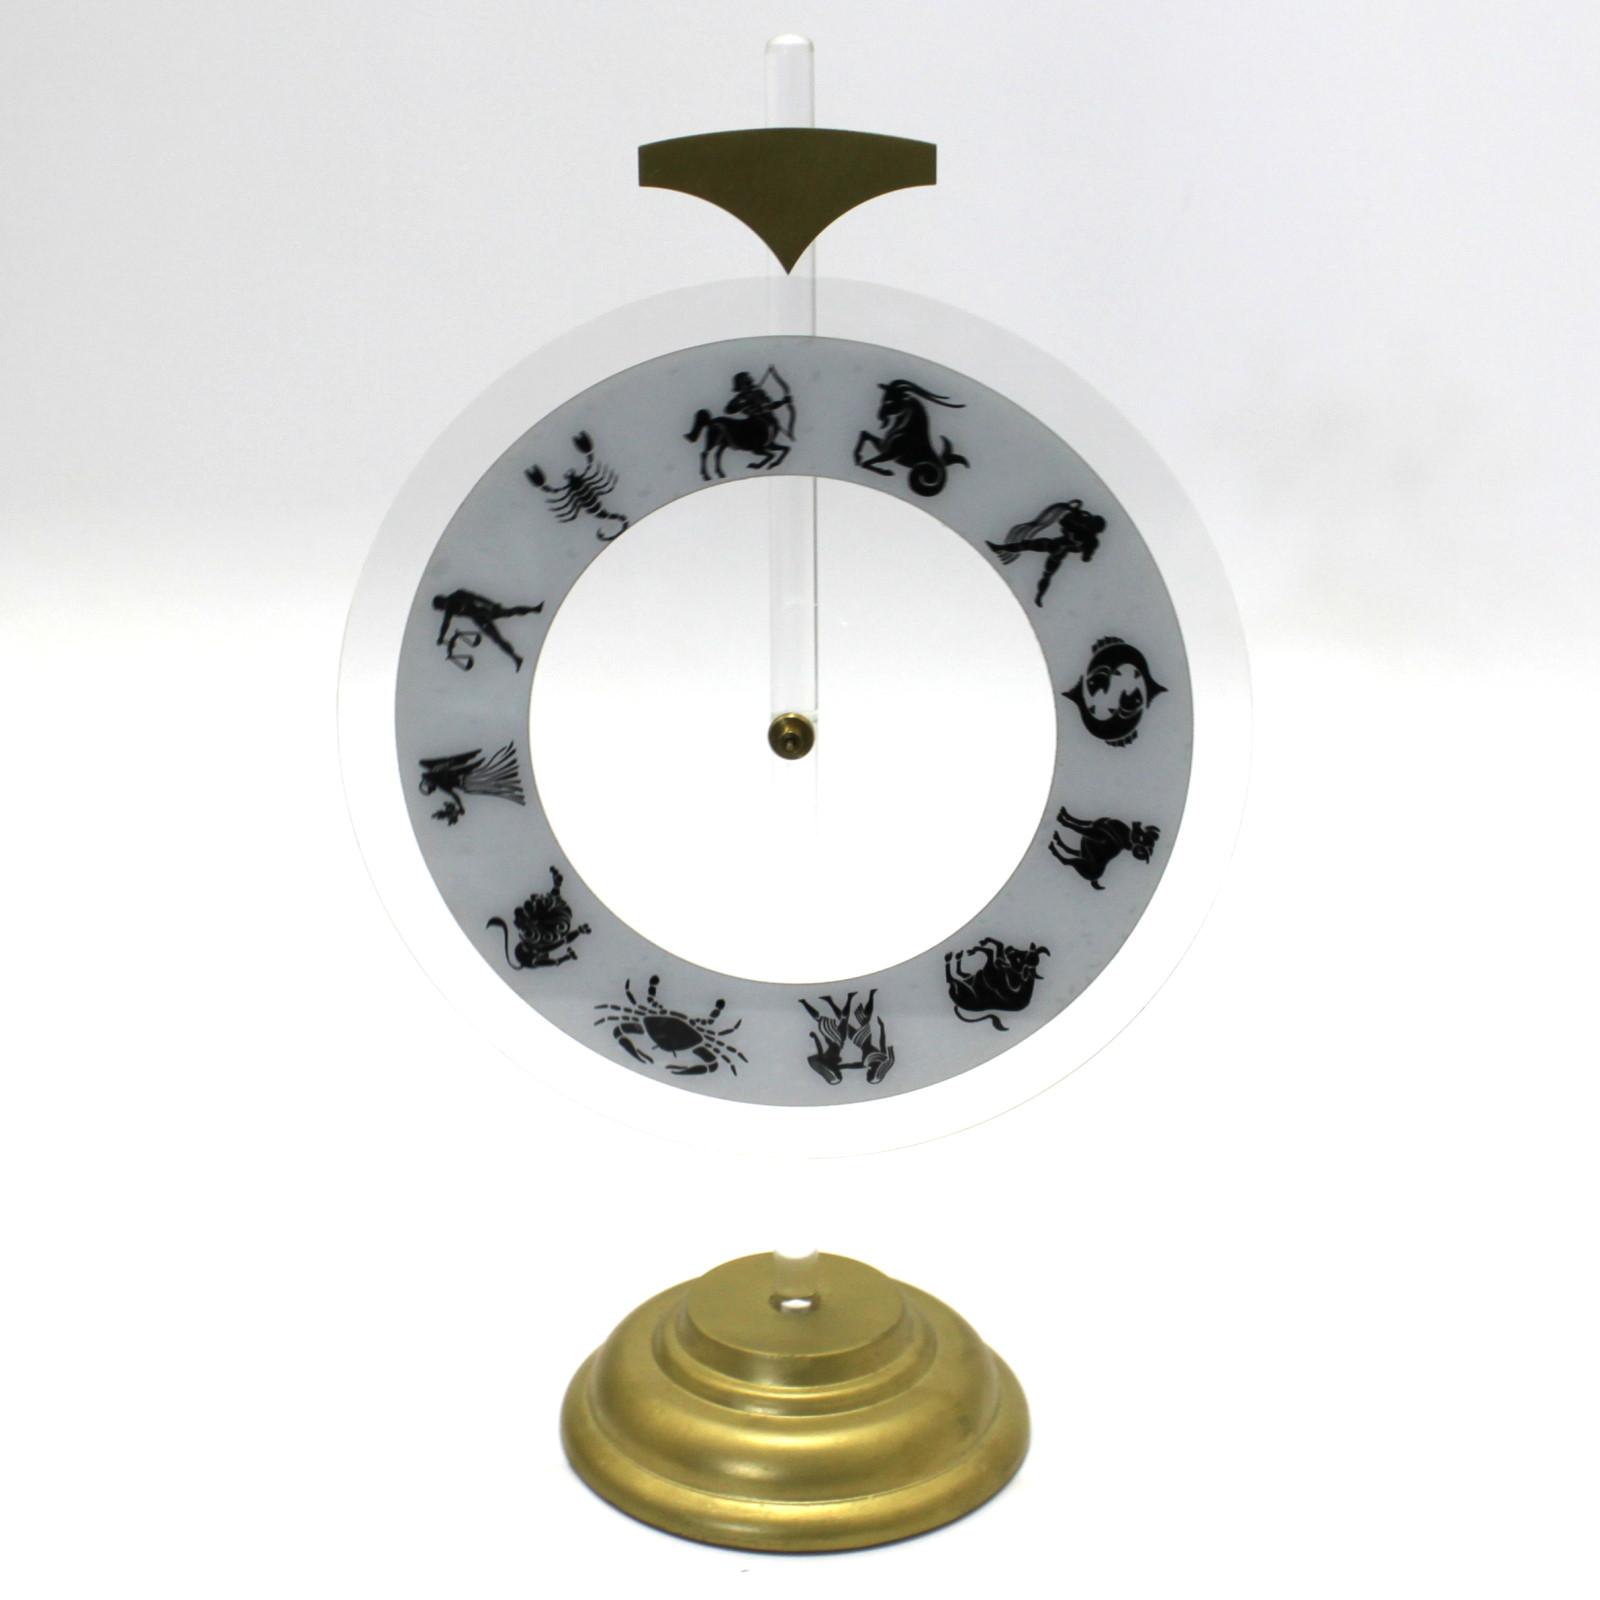 Astral Dial by Tony Lackner